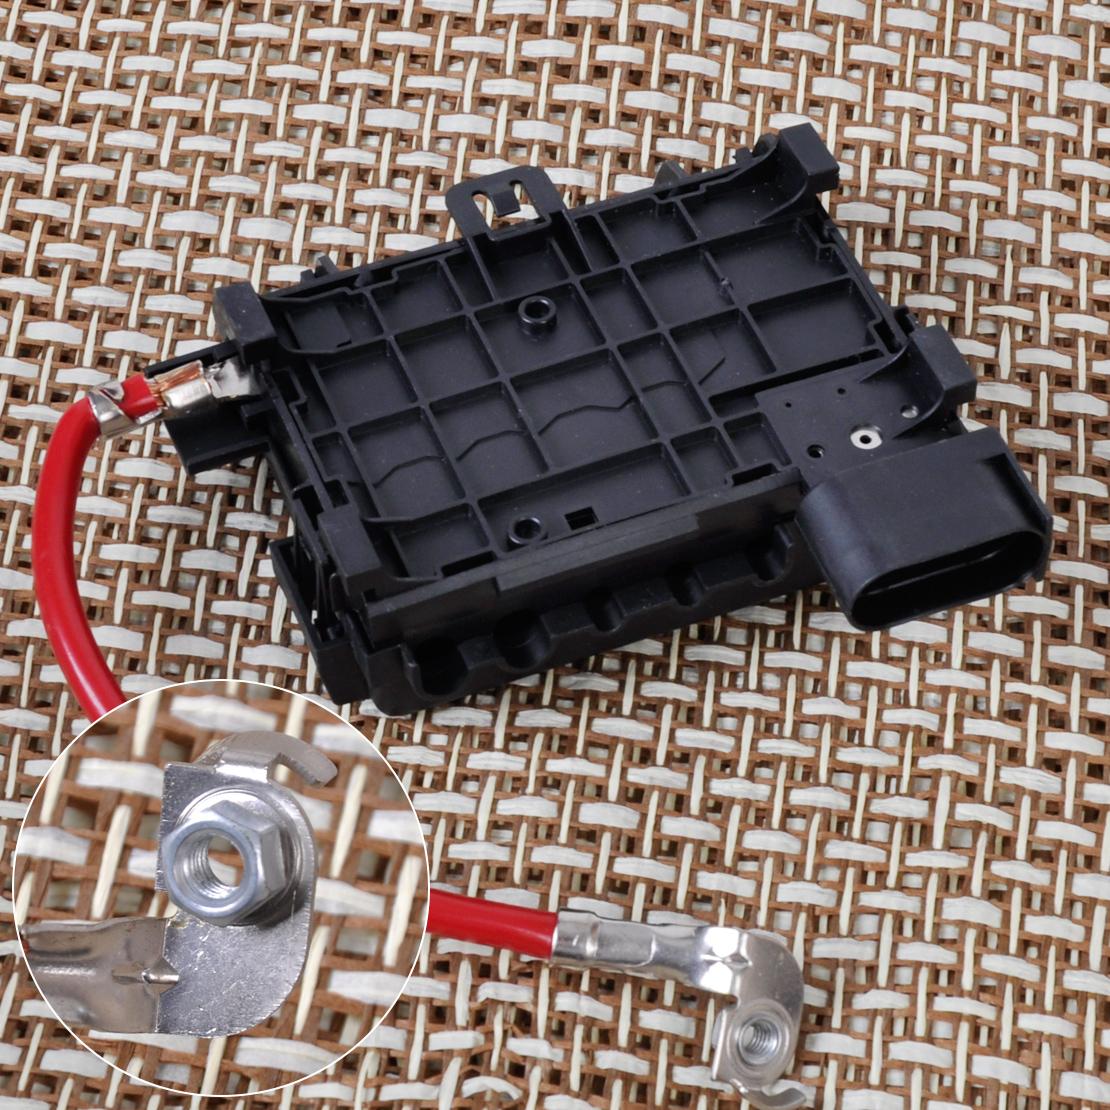 Miraculous Aliexpress Com Buy Citall 1J0937550A Fuse Box Battery Terminal 1J0 Wiring Cloud Mousmenurrecoveryedborg